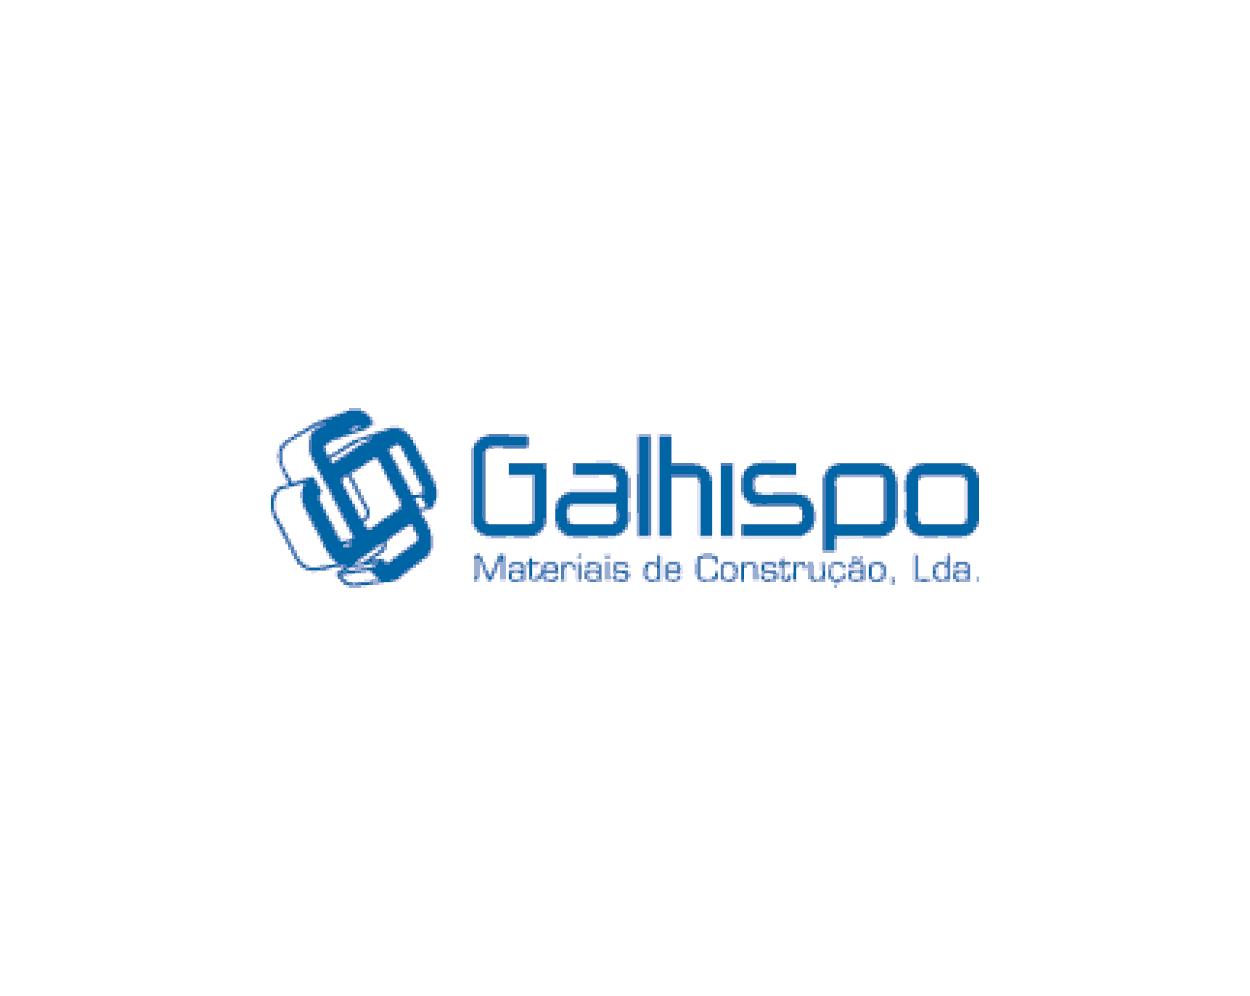 Galhispo